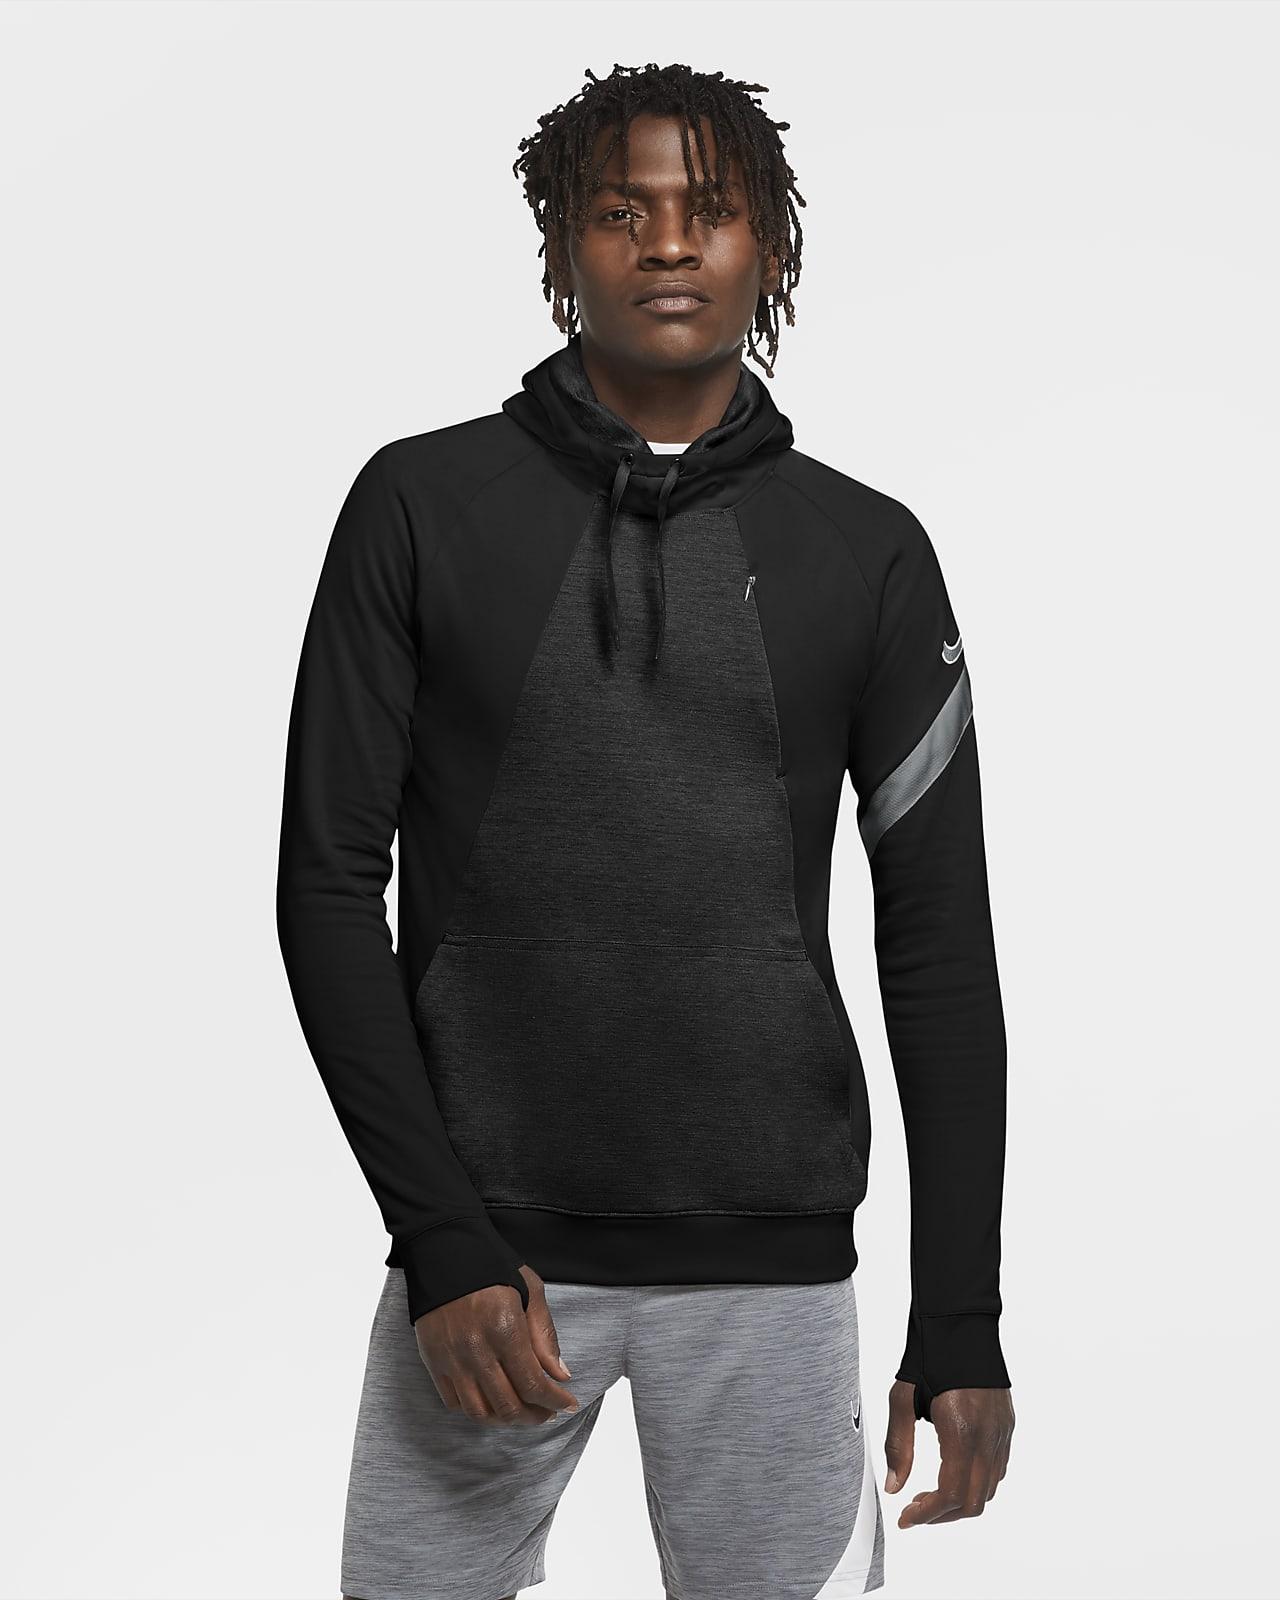 Hoodie pullover de futebol Nike Dri-FIT Academy para homem